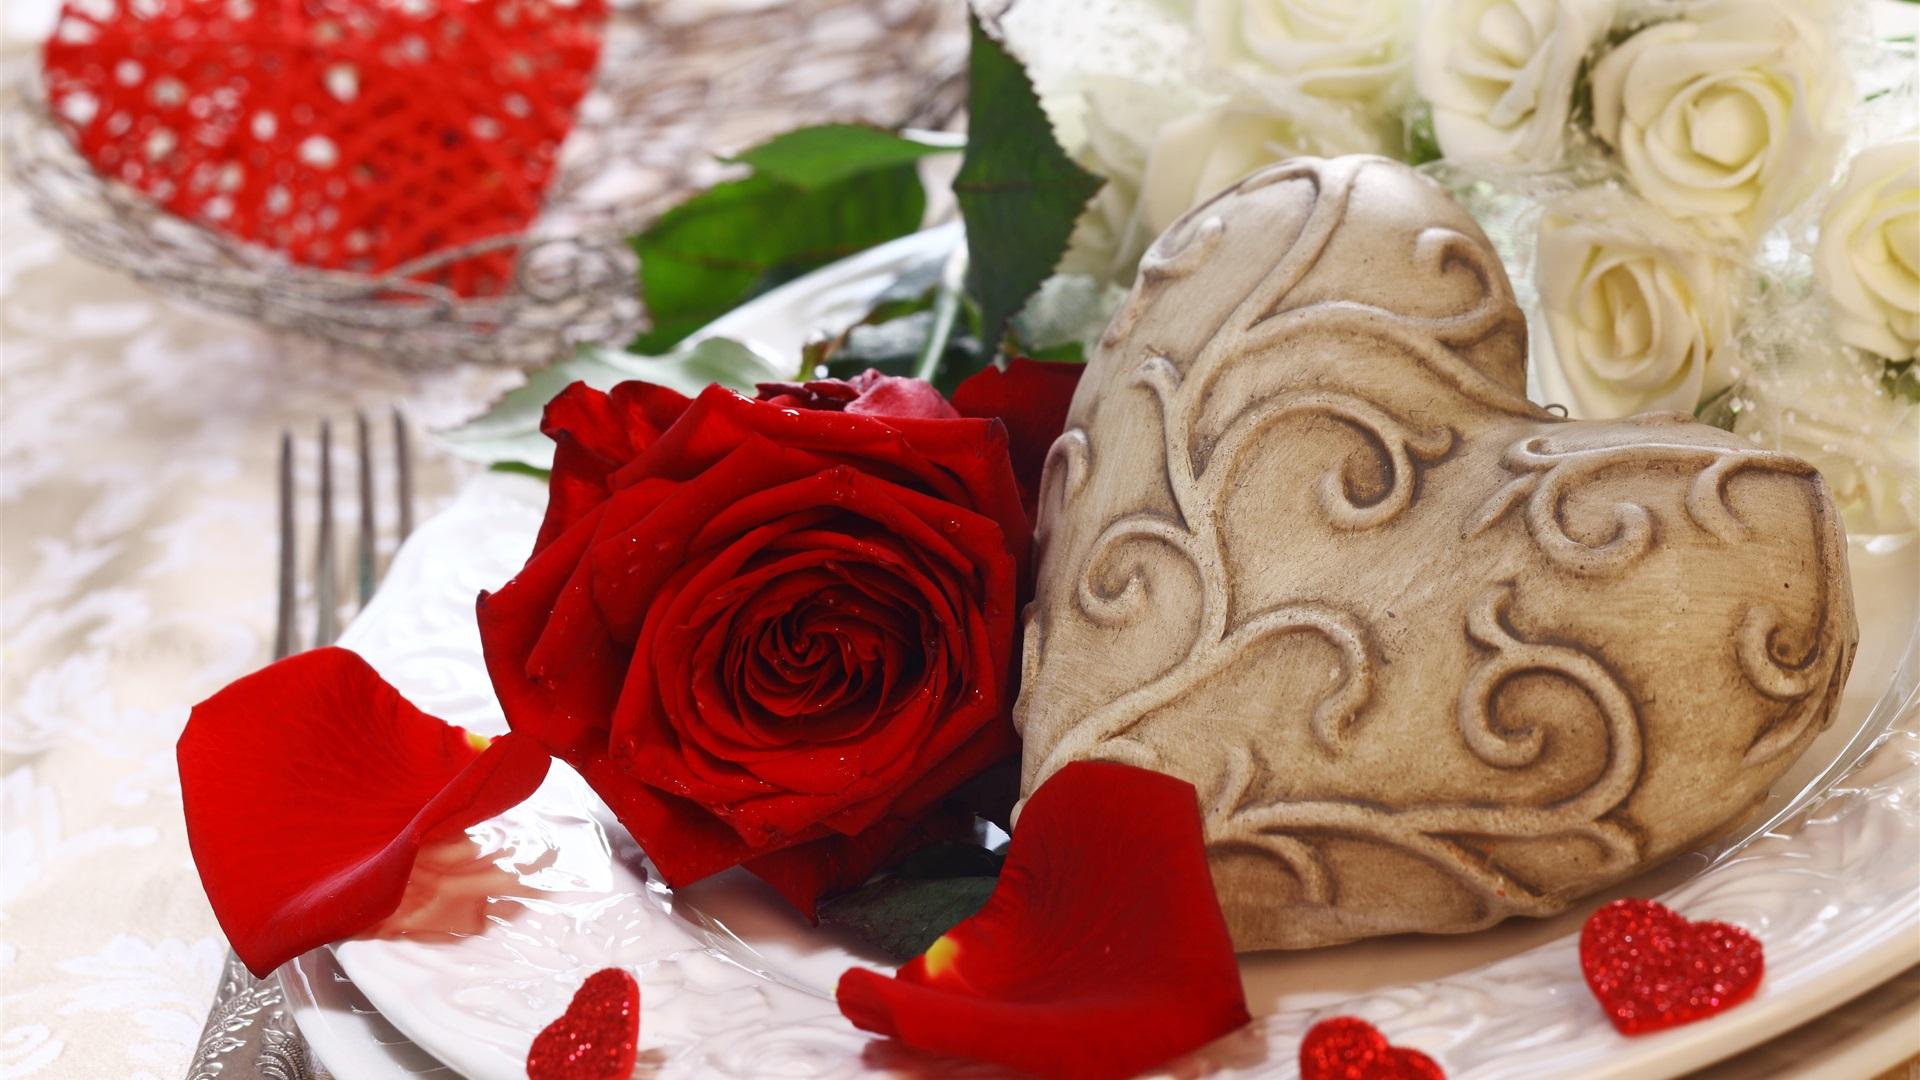 Wallpaper Red Rose Love Heart Romantic 3840x2160 Uhd 4k